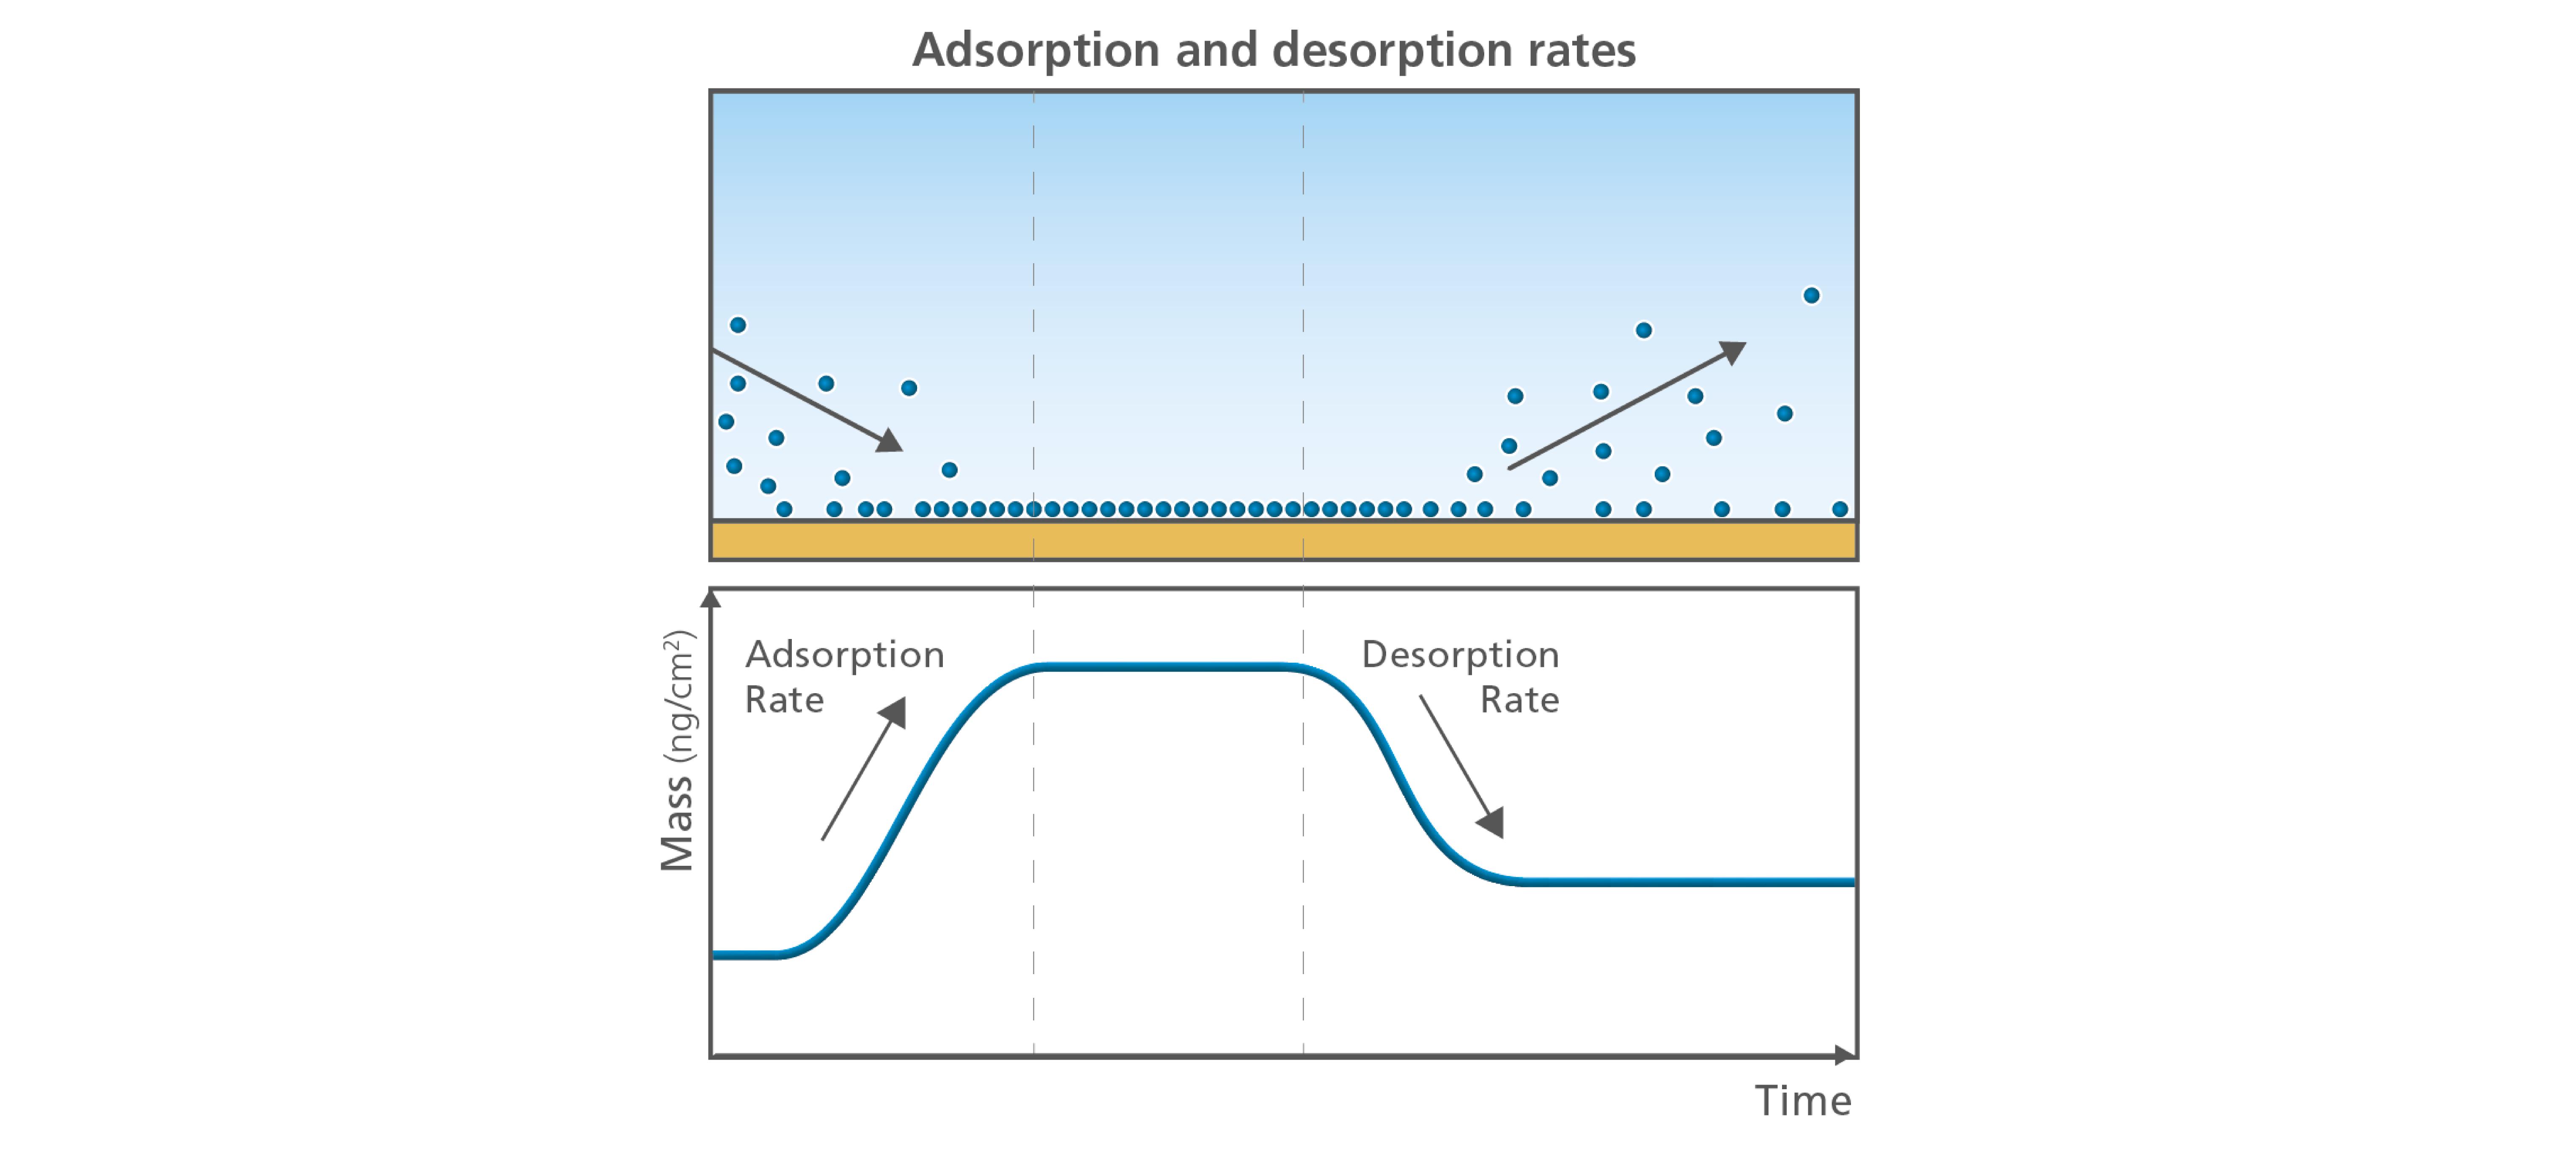 Fig 4. QSense Adsorption-Desorption